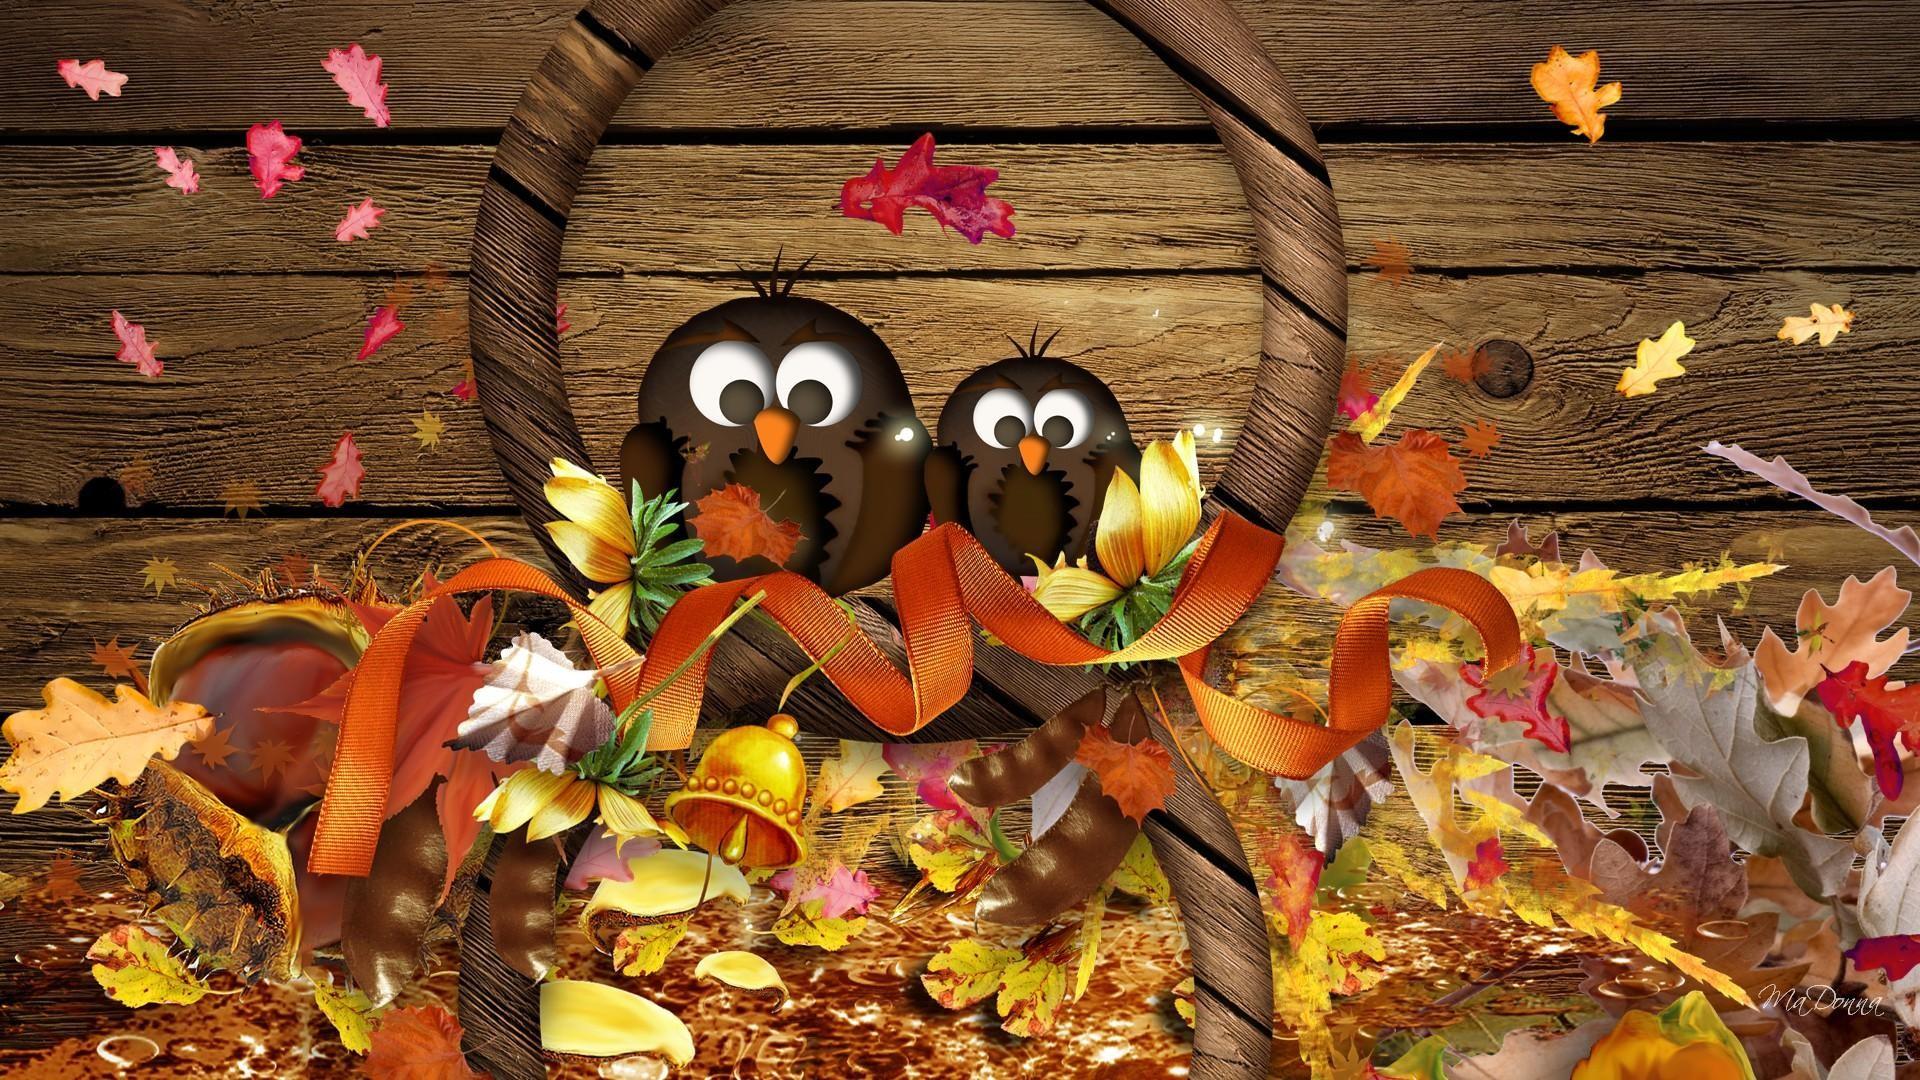 Most Inspiring Wallpaper High Resolution Thanksgiving - 1117681-fall-thanksgiving-wallpaper-1920x1080-high-resolution  Graphic_204635.jpg